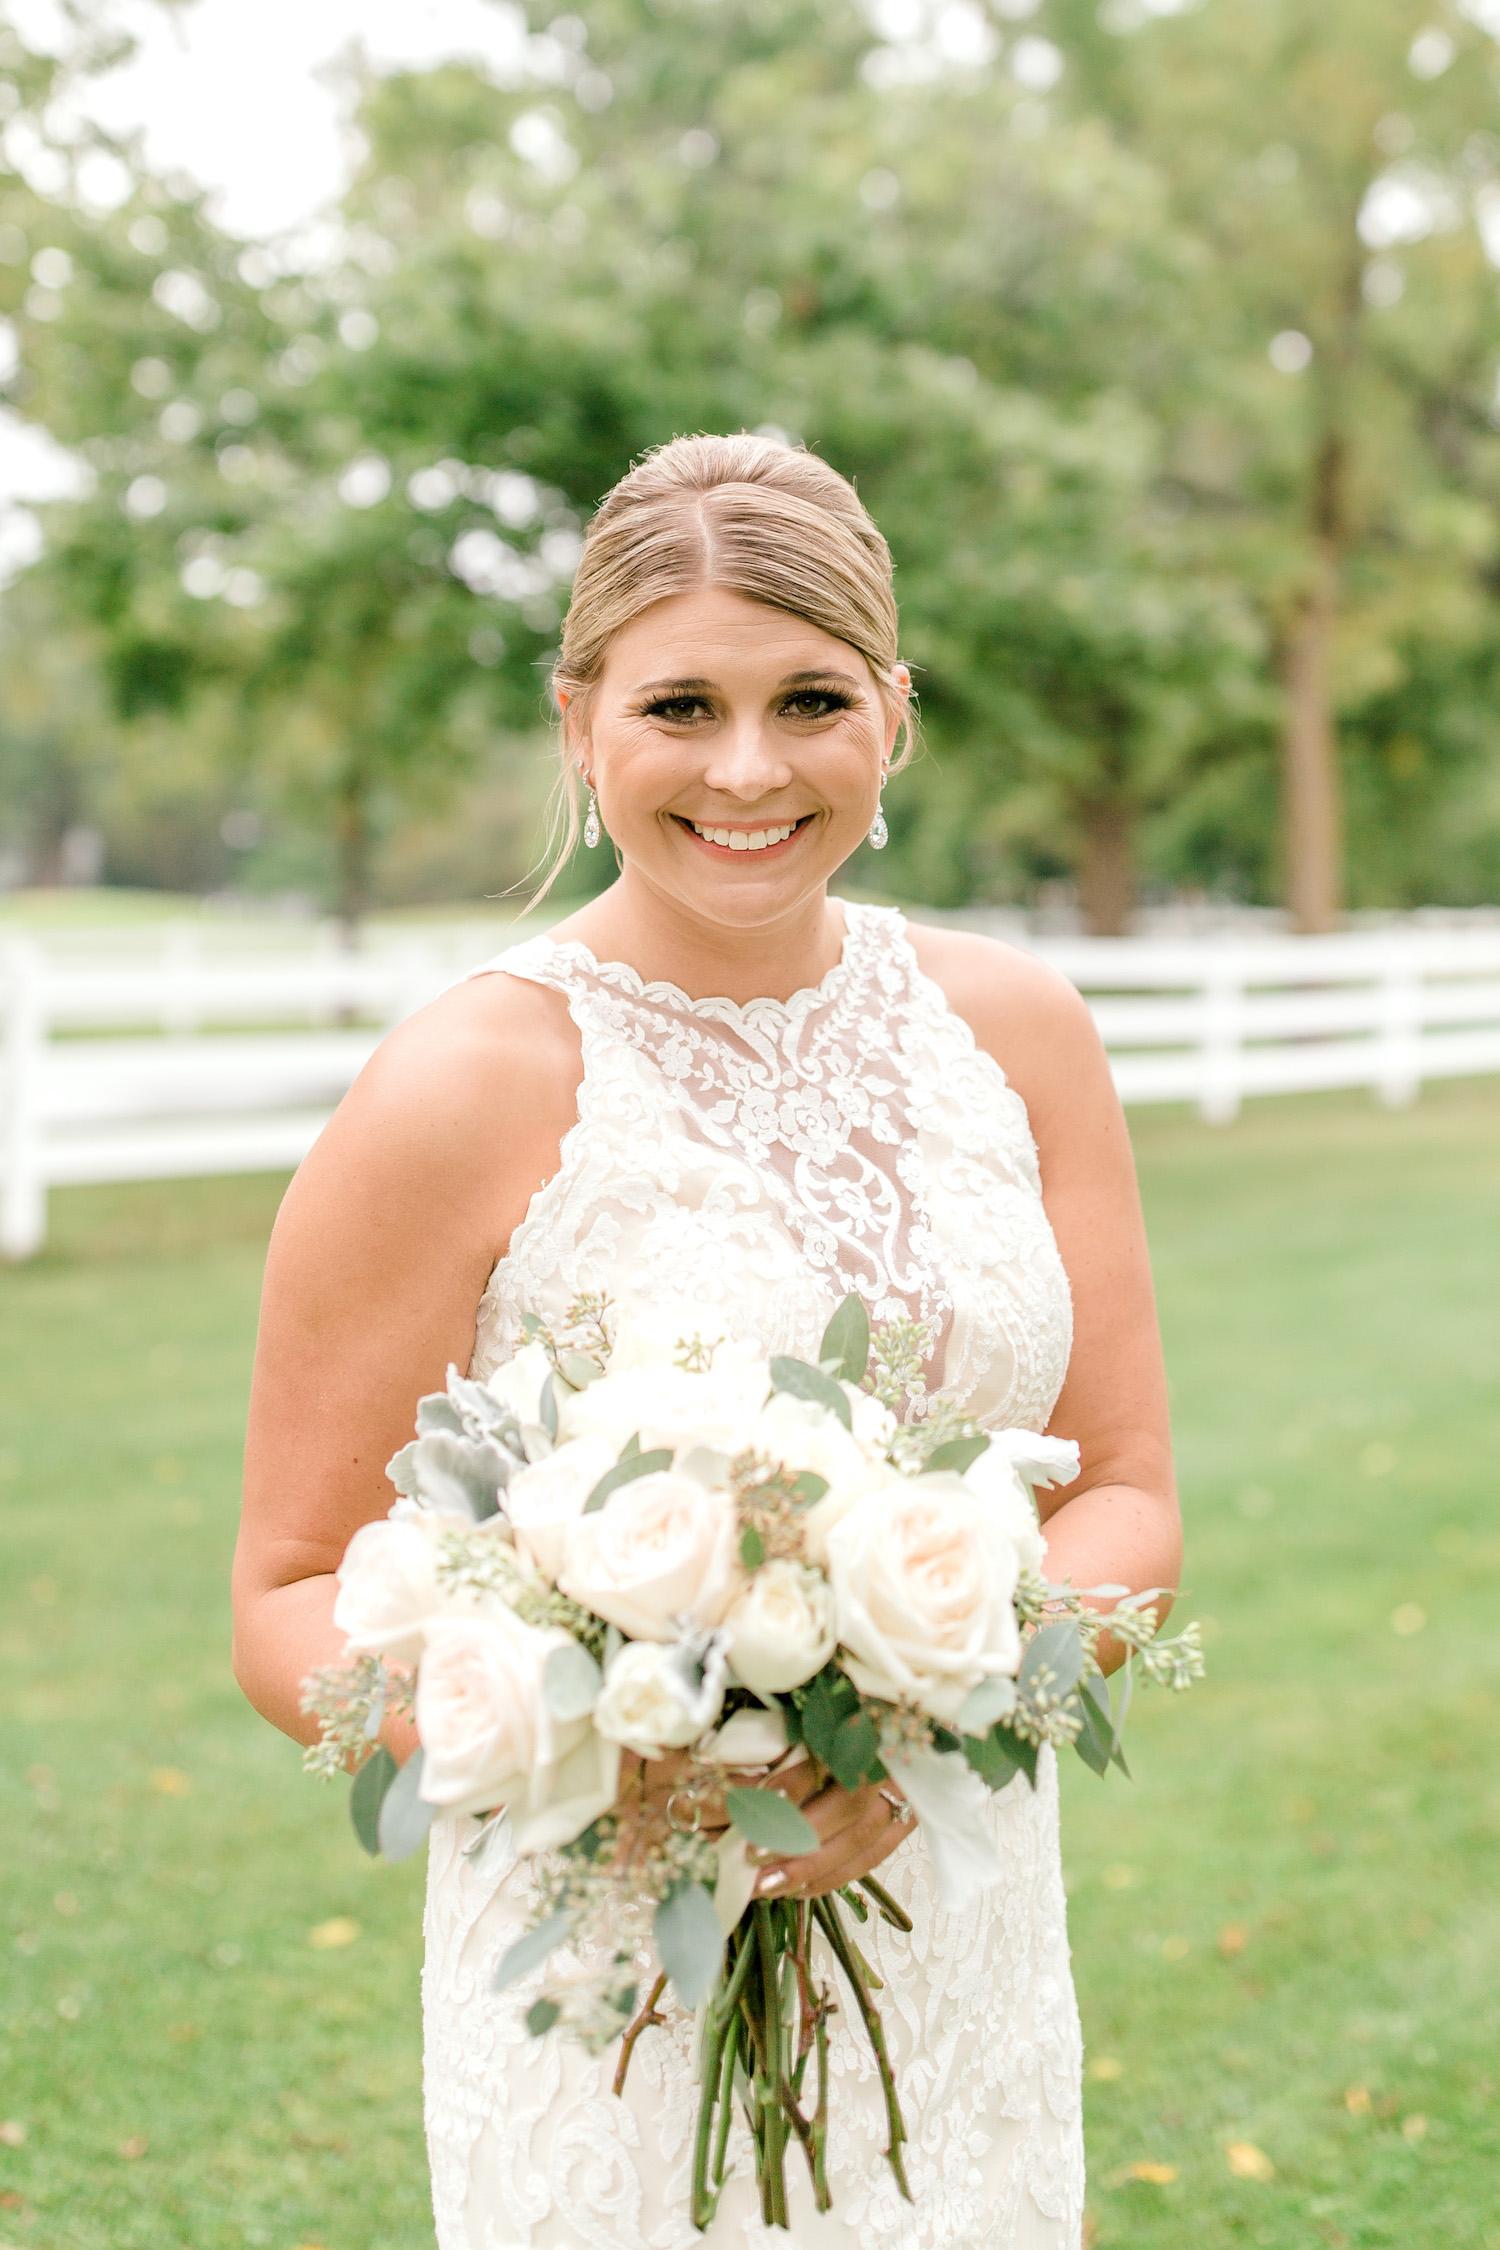 Bride smiling before Wallinwood Springs Golf Course wedding